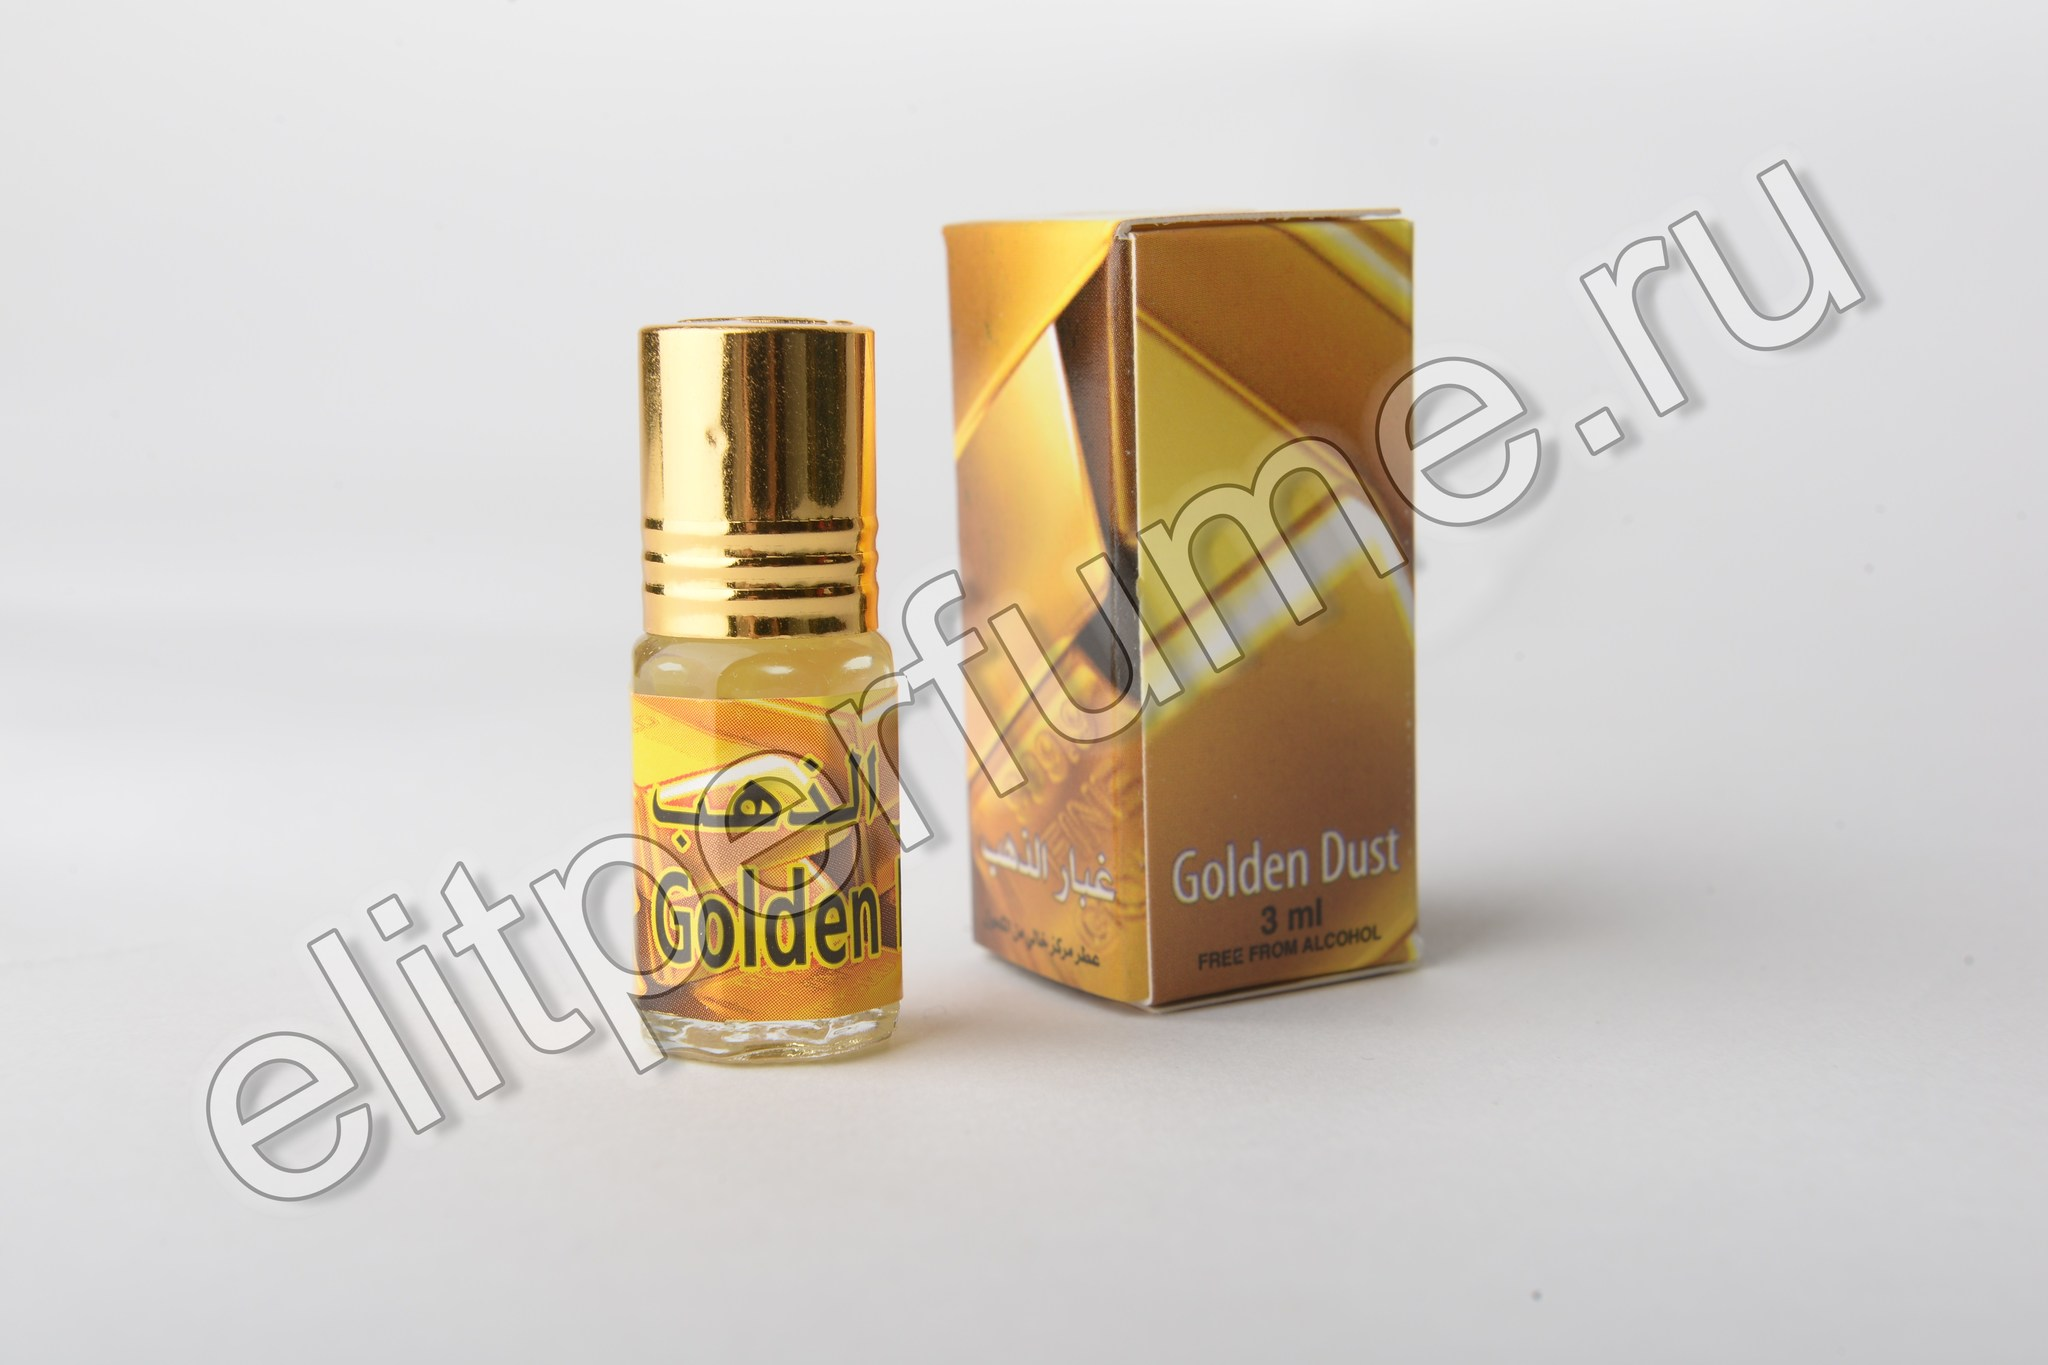 Golden Dust 3 мл арабские масляные духи от Захра Zahra Perfumes